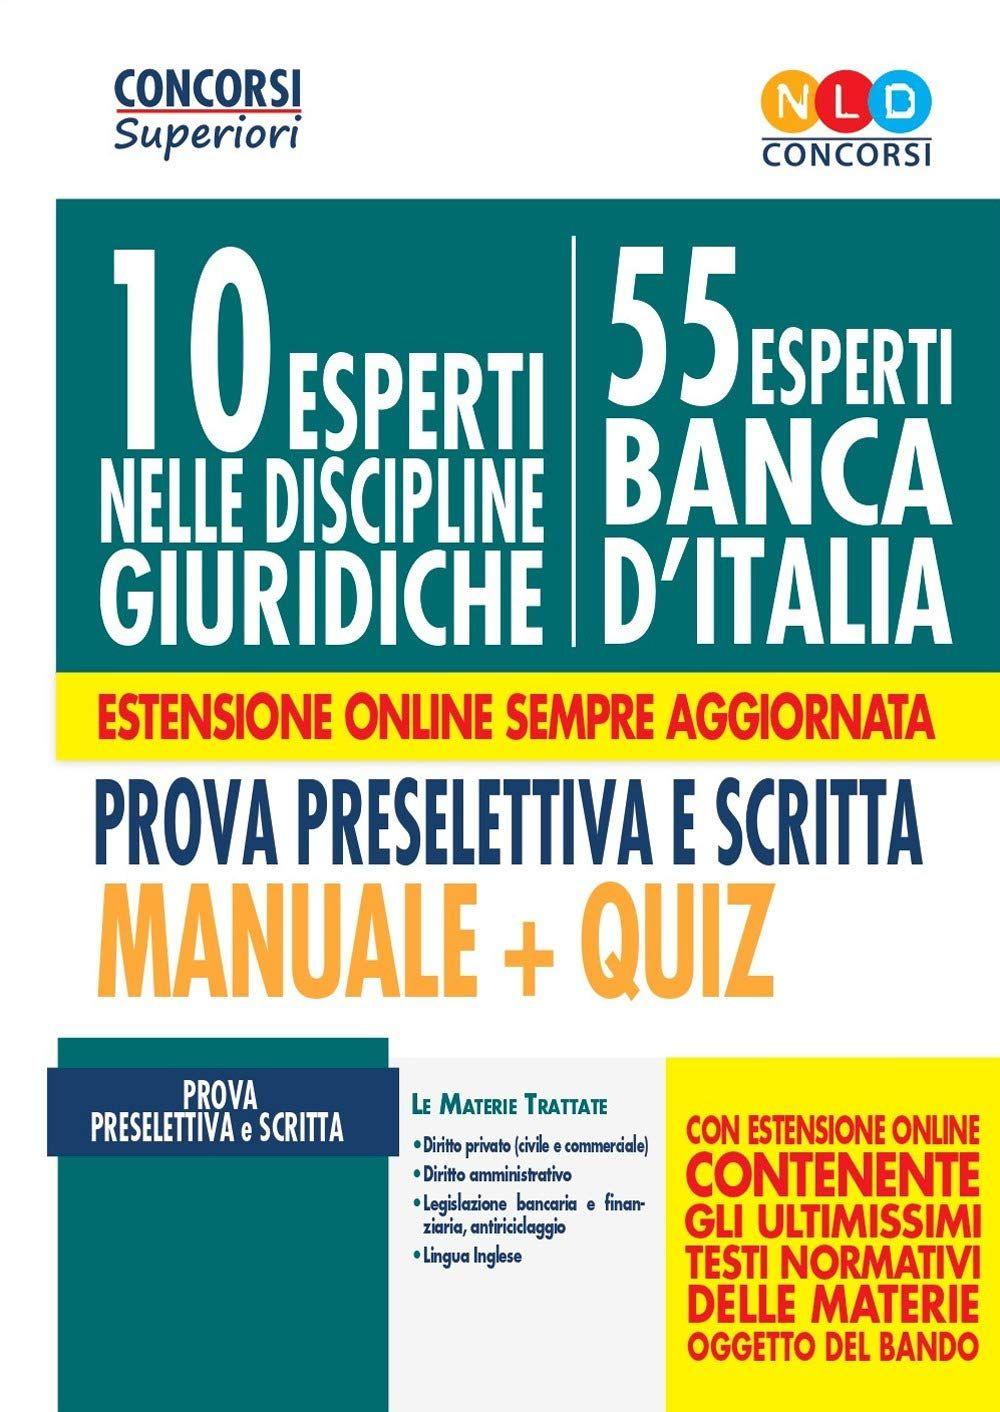 37+ Quiz concorso banca d italia ideas